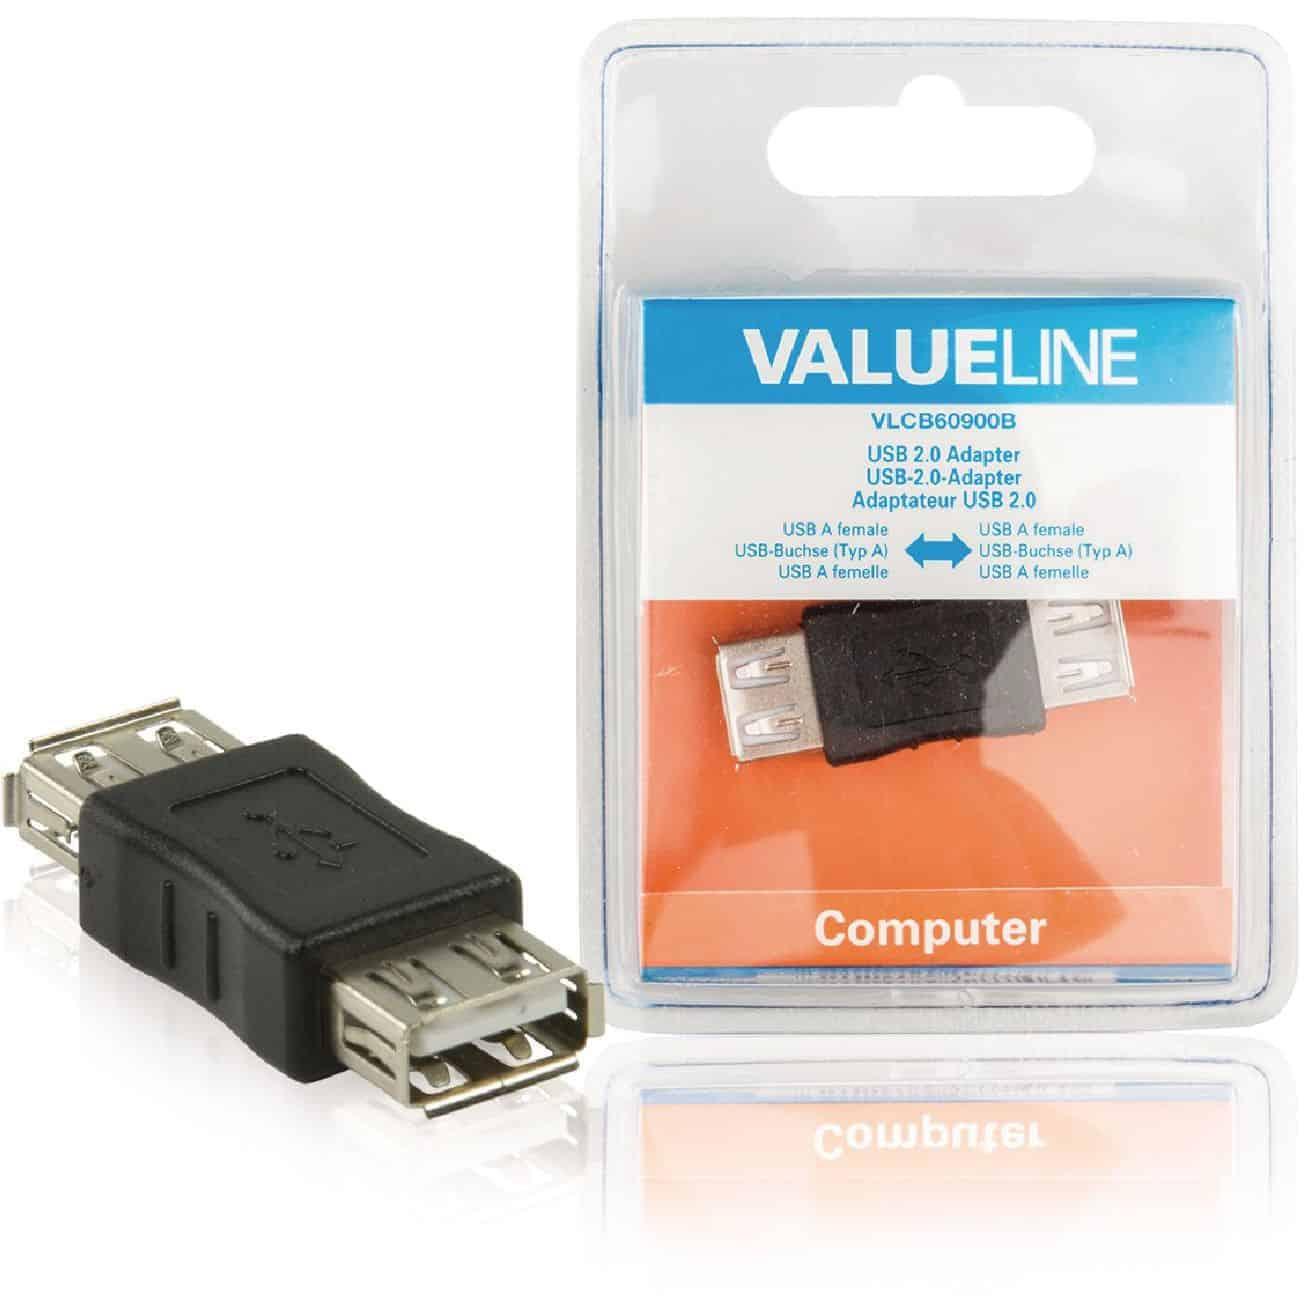 VALUELINE USB 2.0 ADAPTERI A NAARAS - A NAARAS